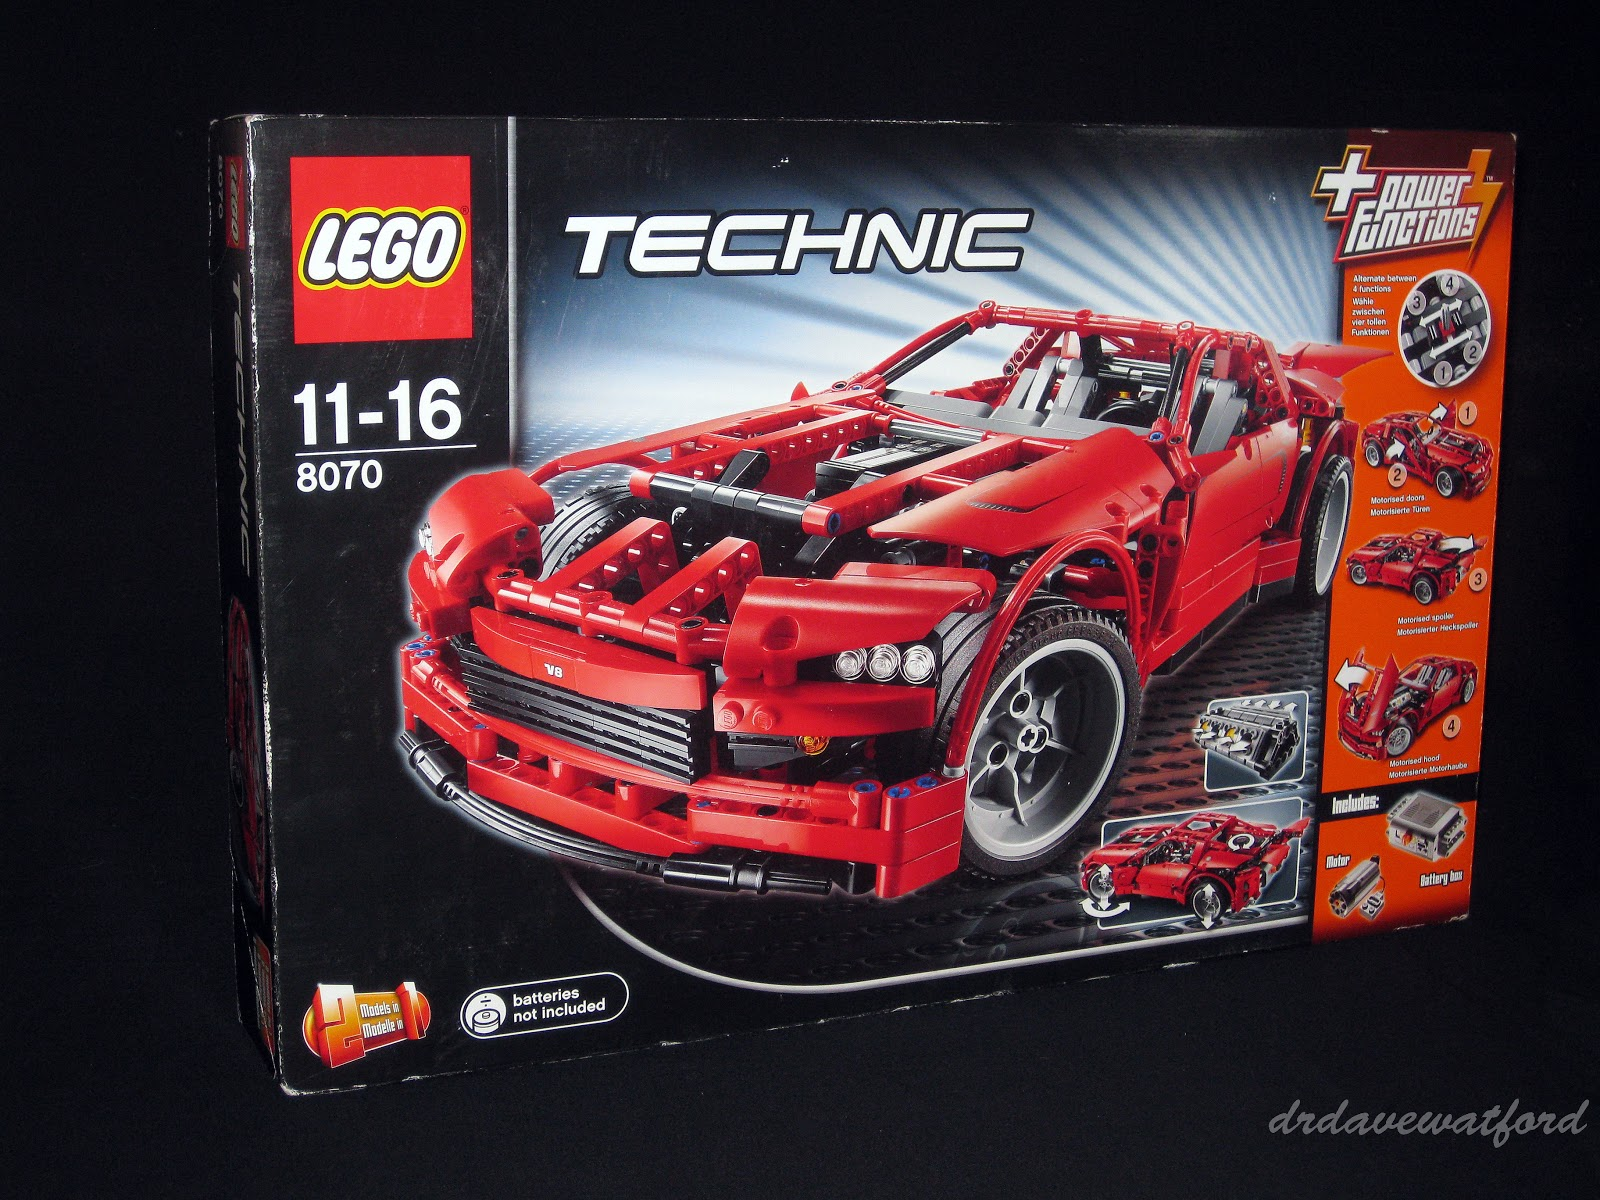 Gimme lego technic temptation for 1 box auto